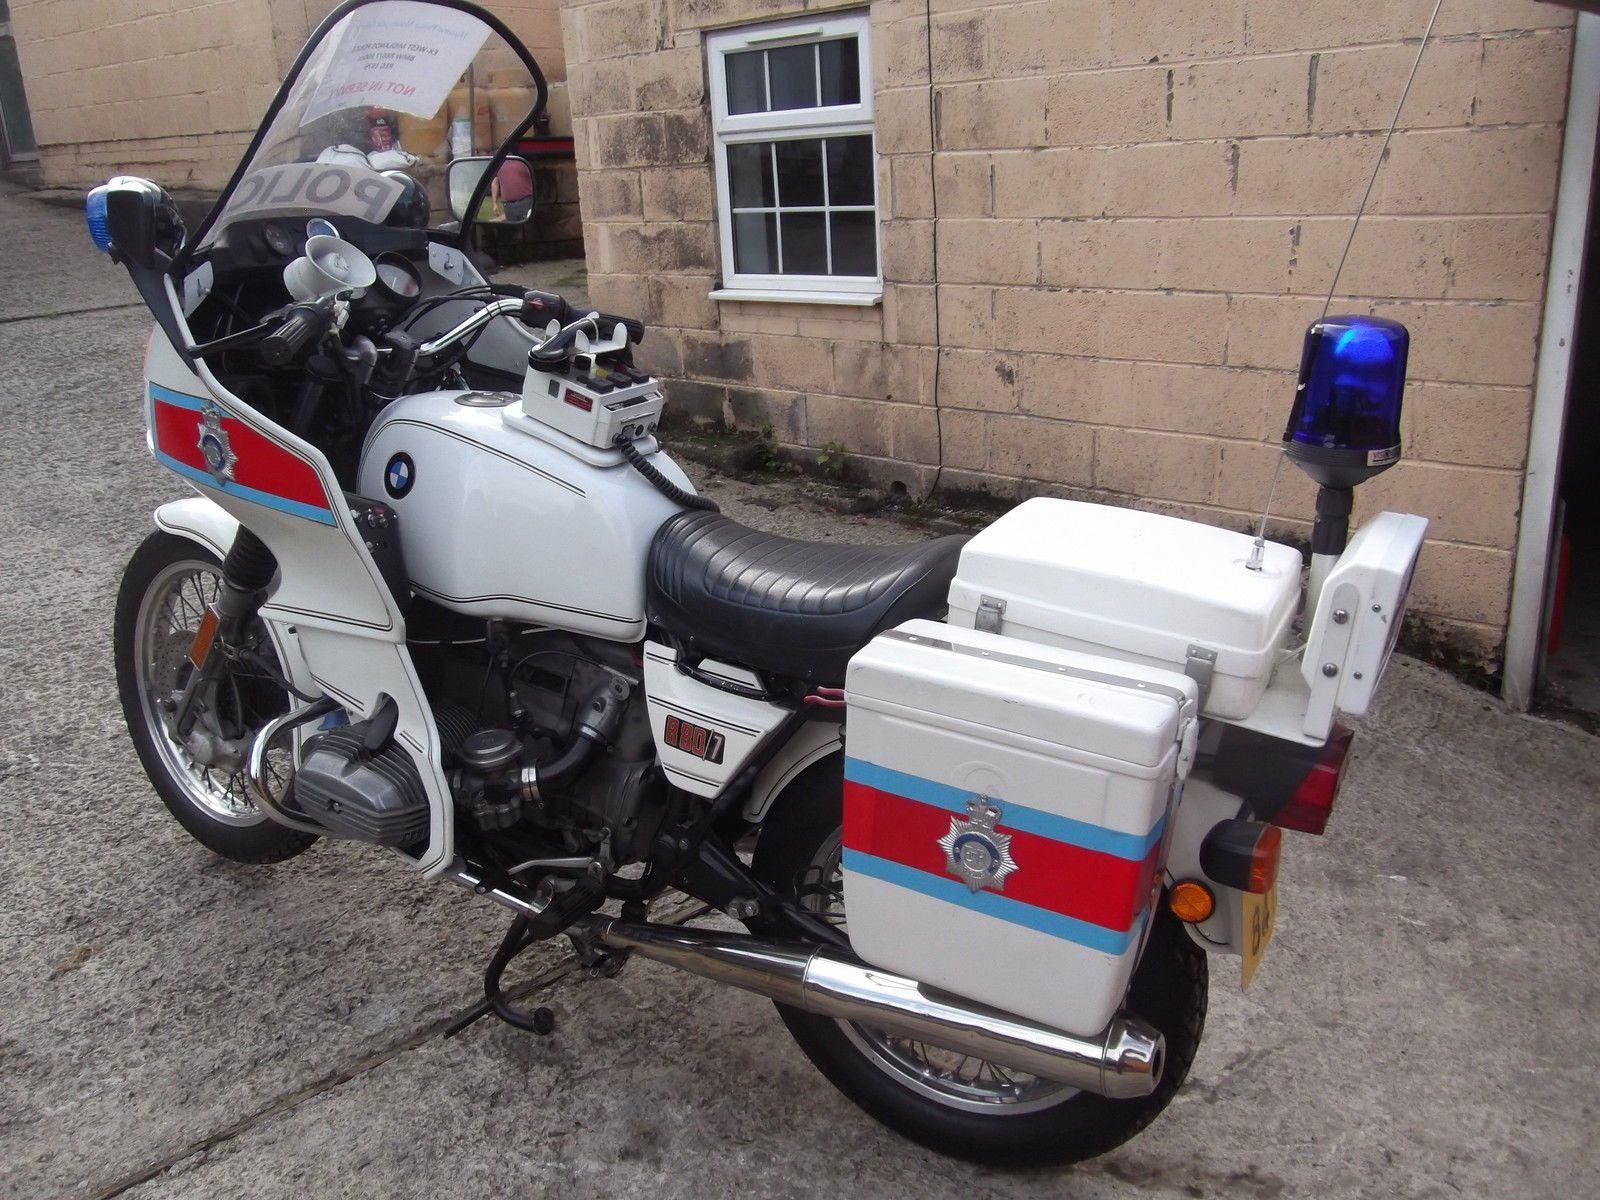 1979 bmw r80 ex police motorcycle 800cc restored good runner poss film work ebay [ 1600 x 1200 Pixel ]